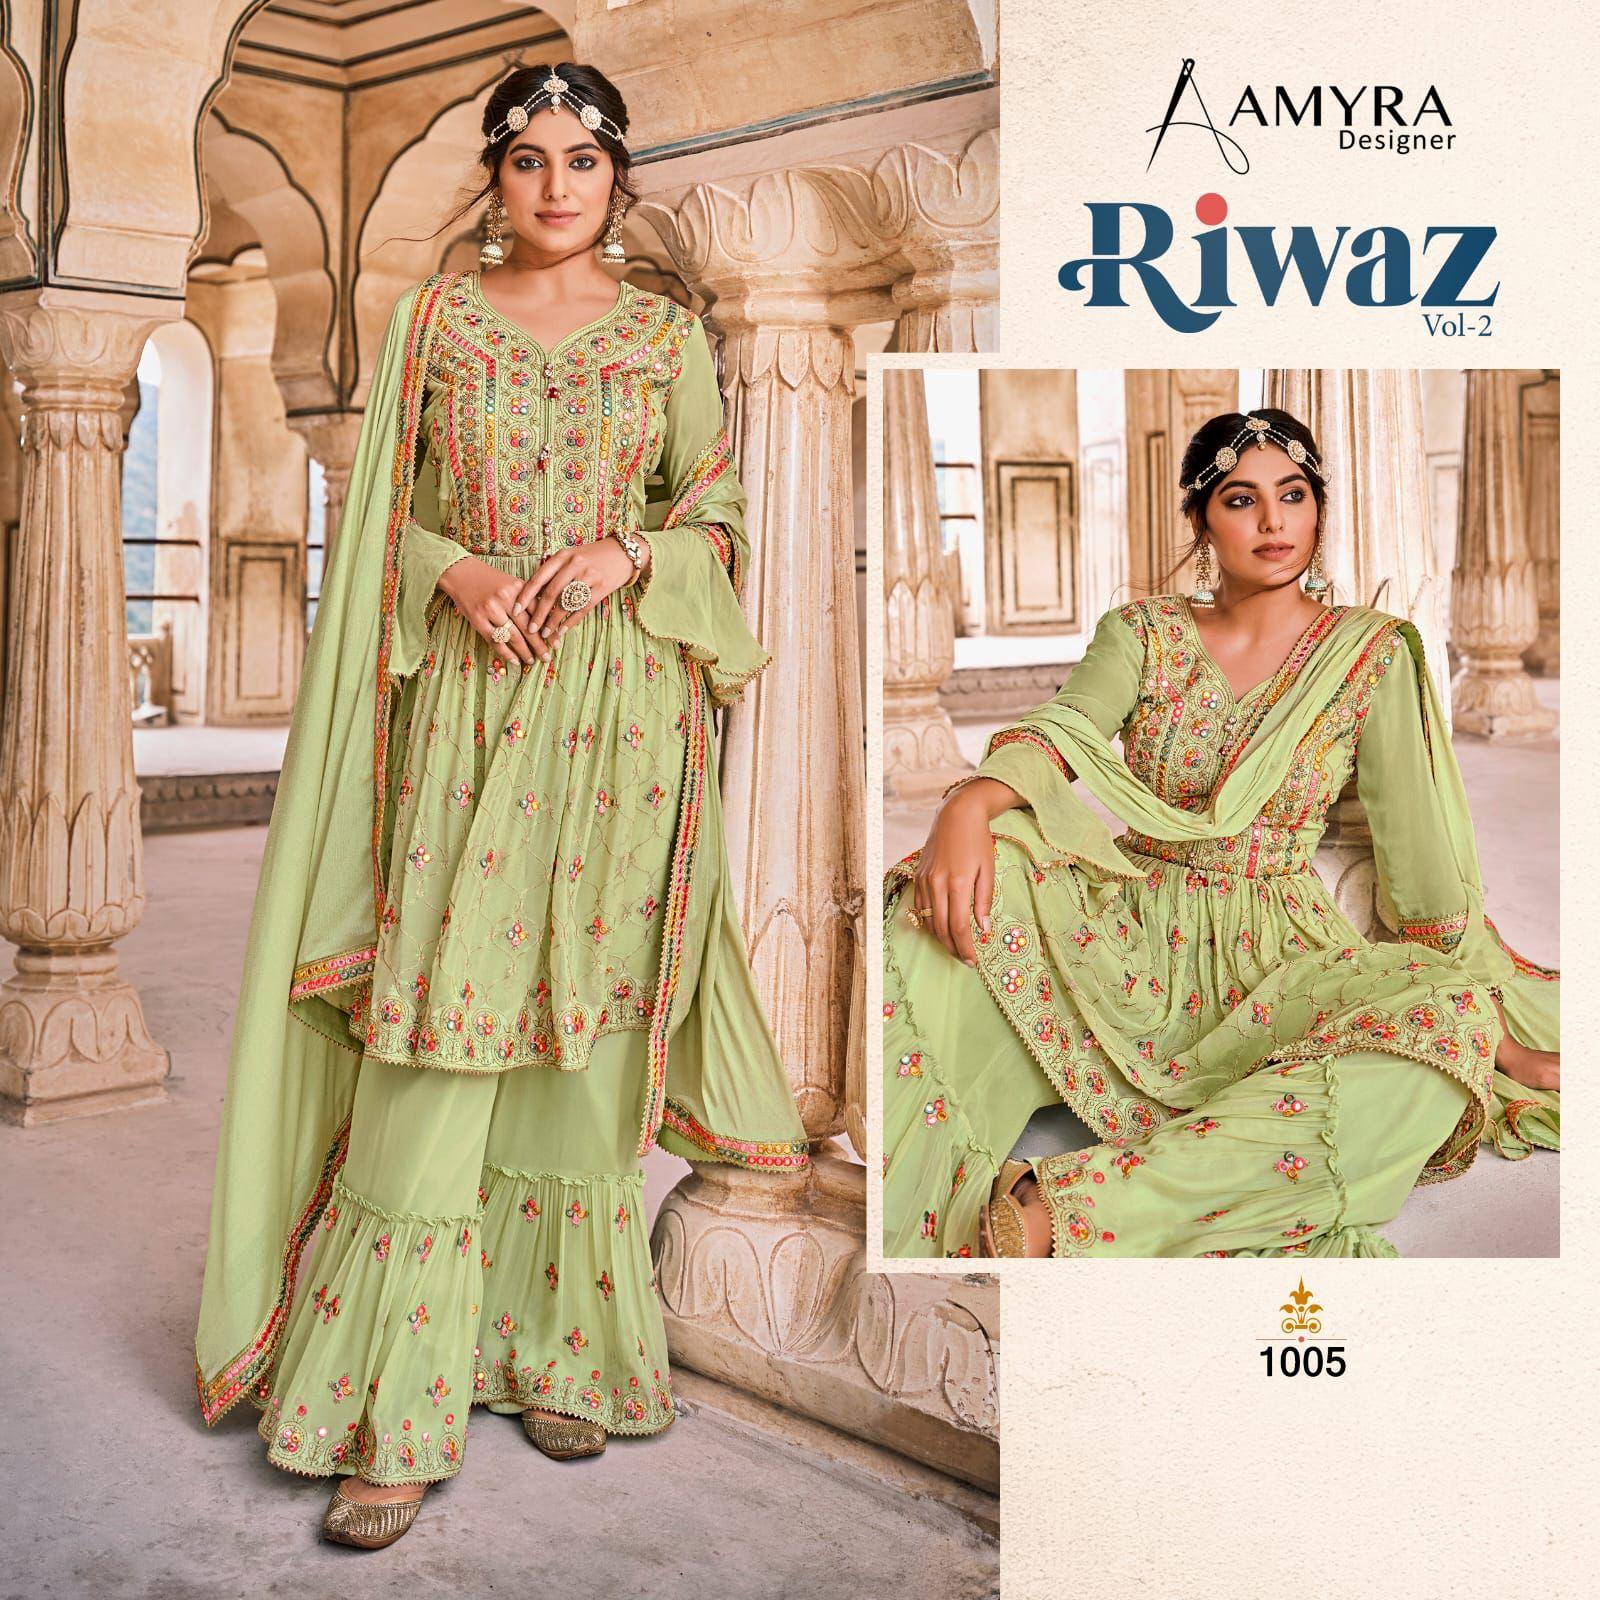 Aamyra Designer Riwaz Vol 2 Sharara Style Suits Catalog Lowest Price